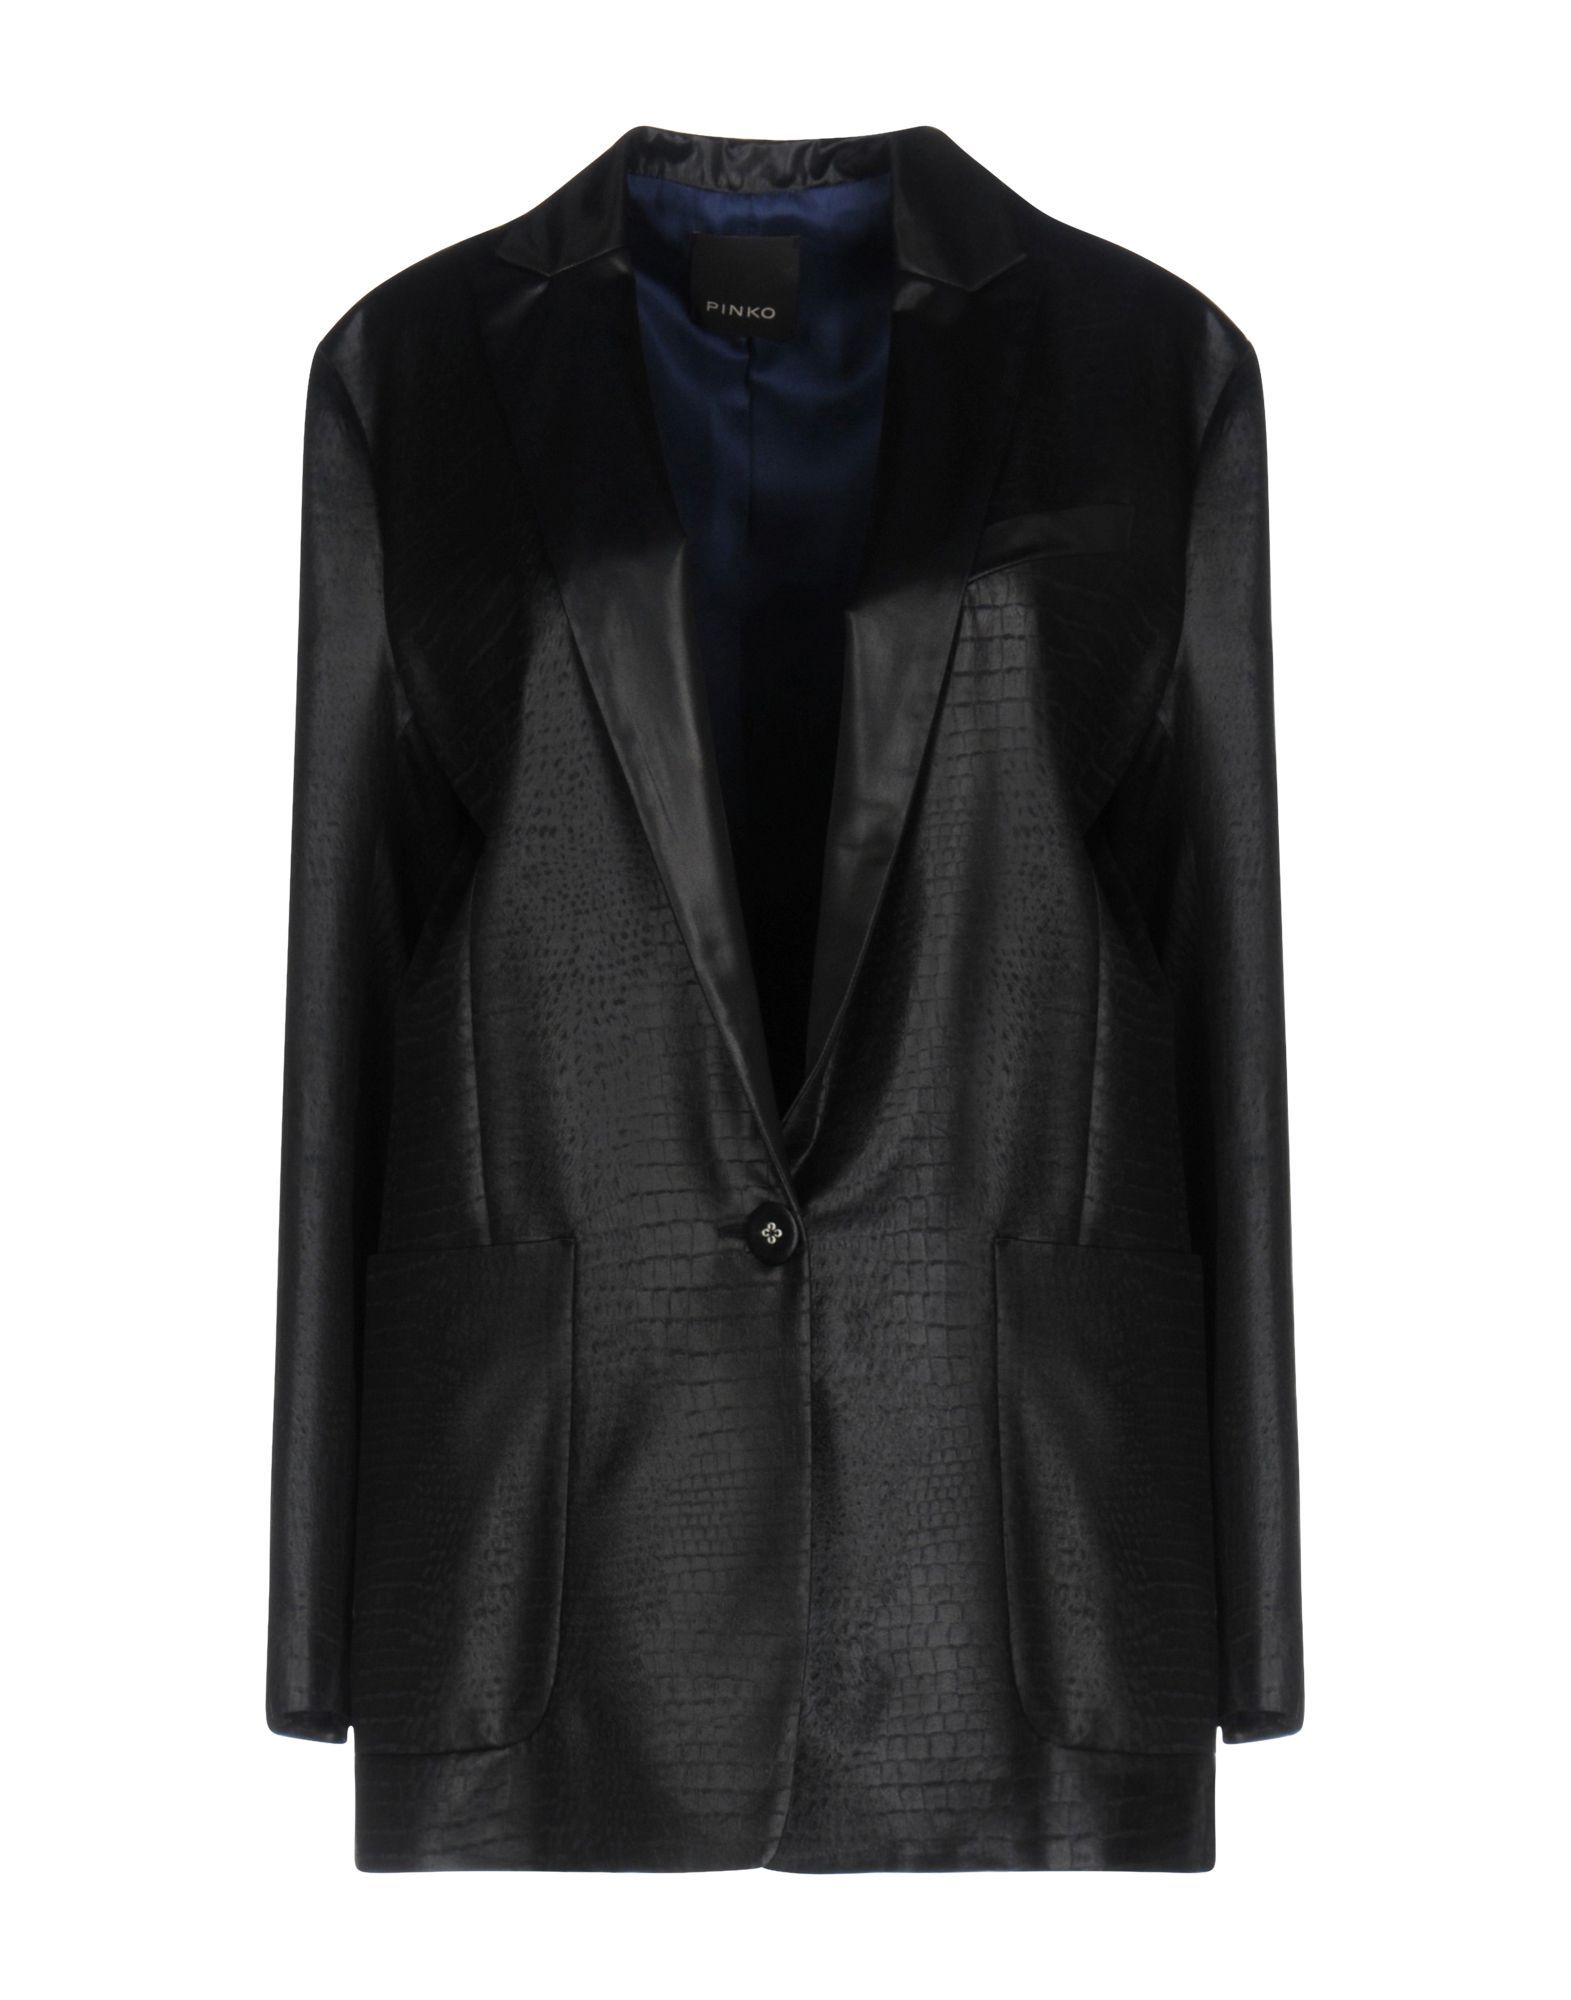 Pinko Black Single Breasted Blazer